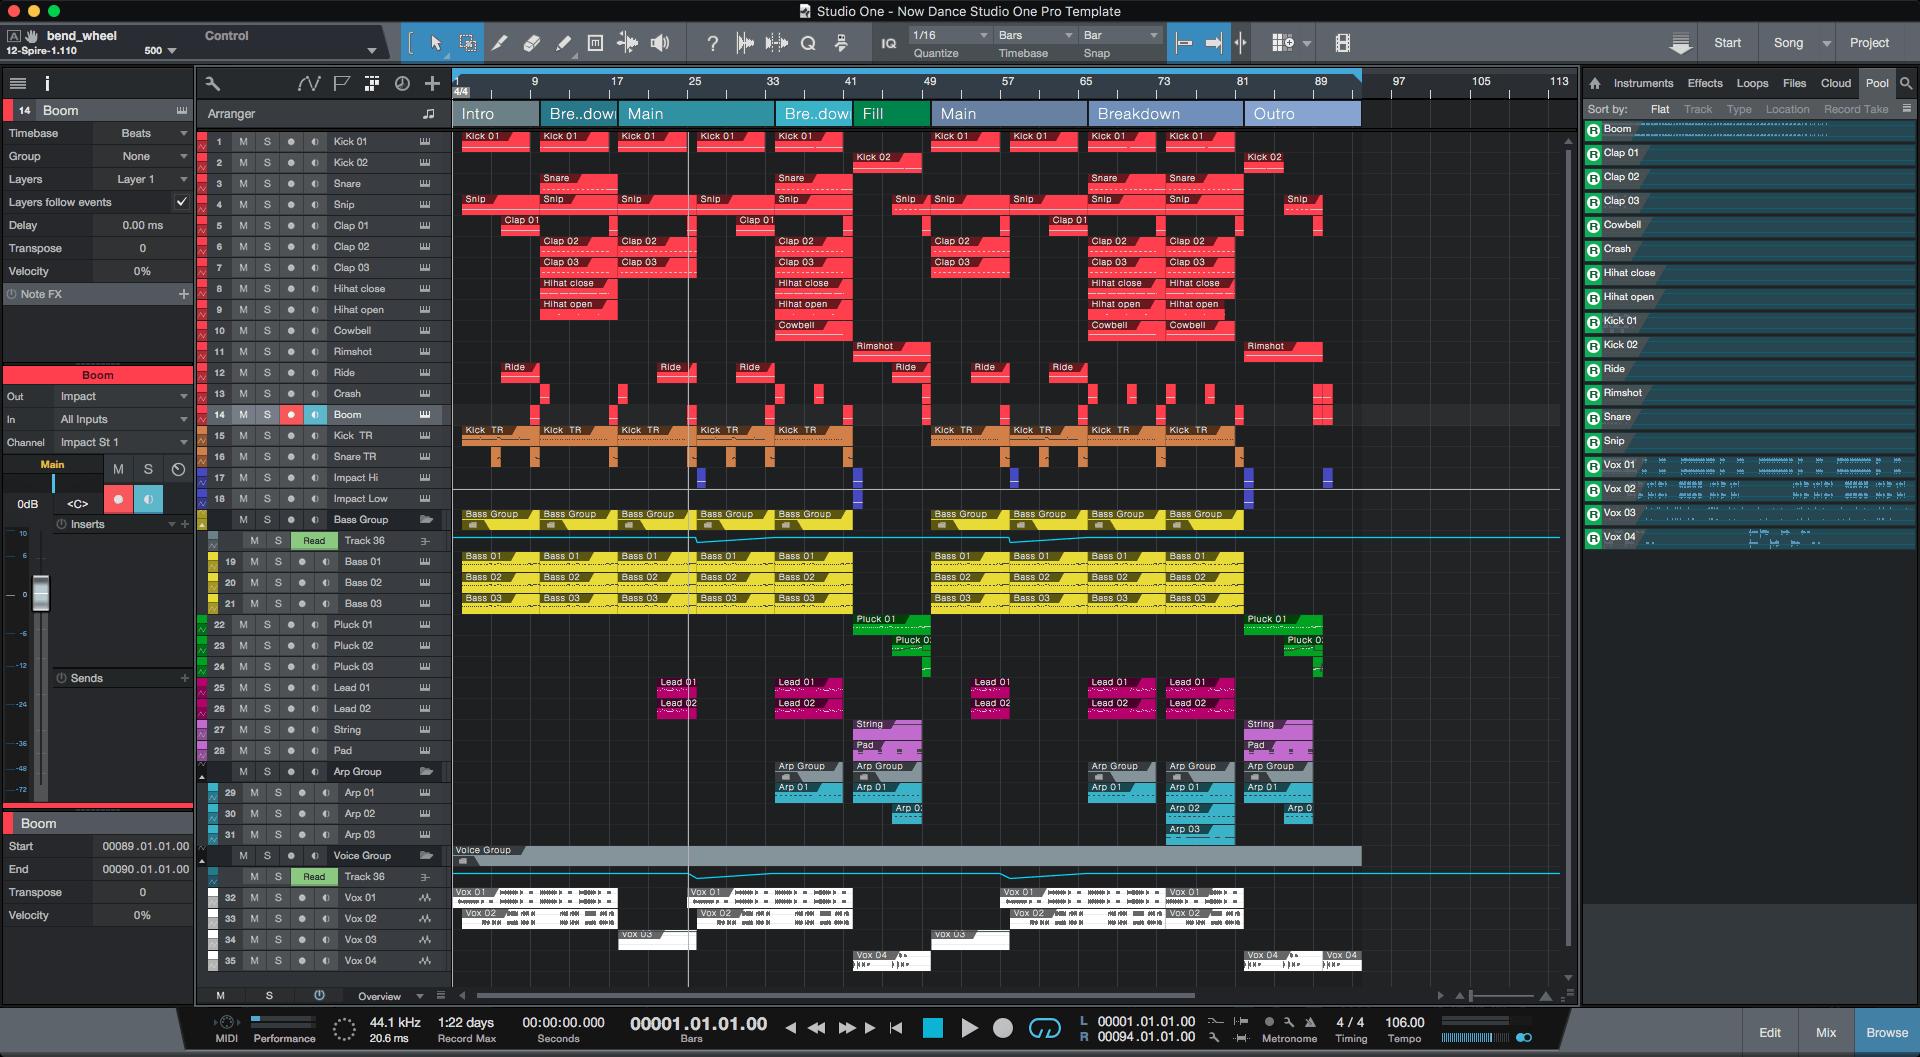 now dance studio one pro template